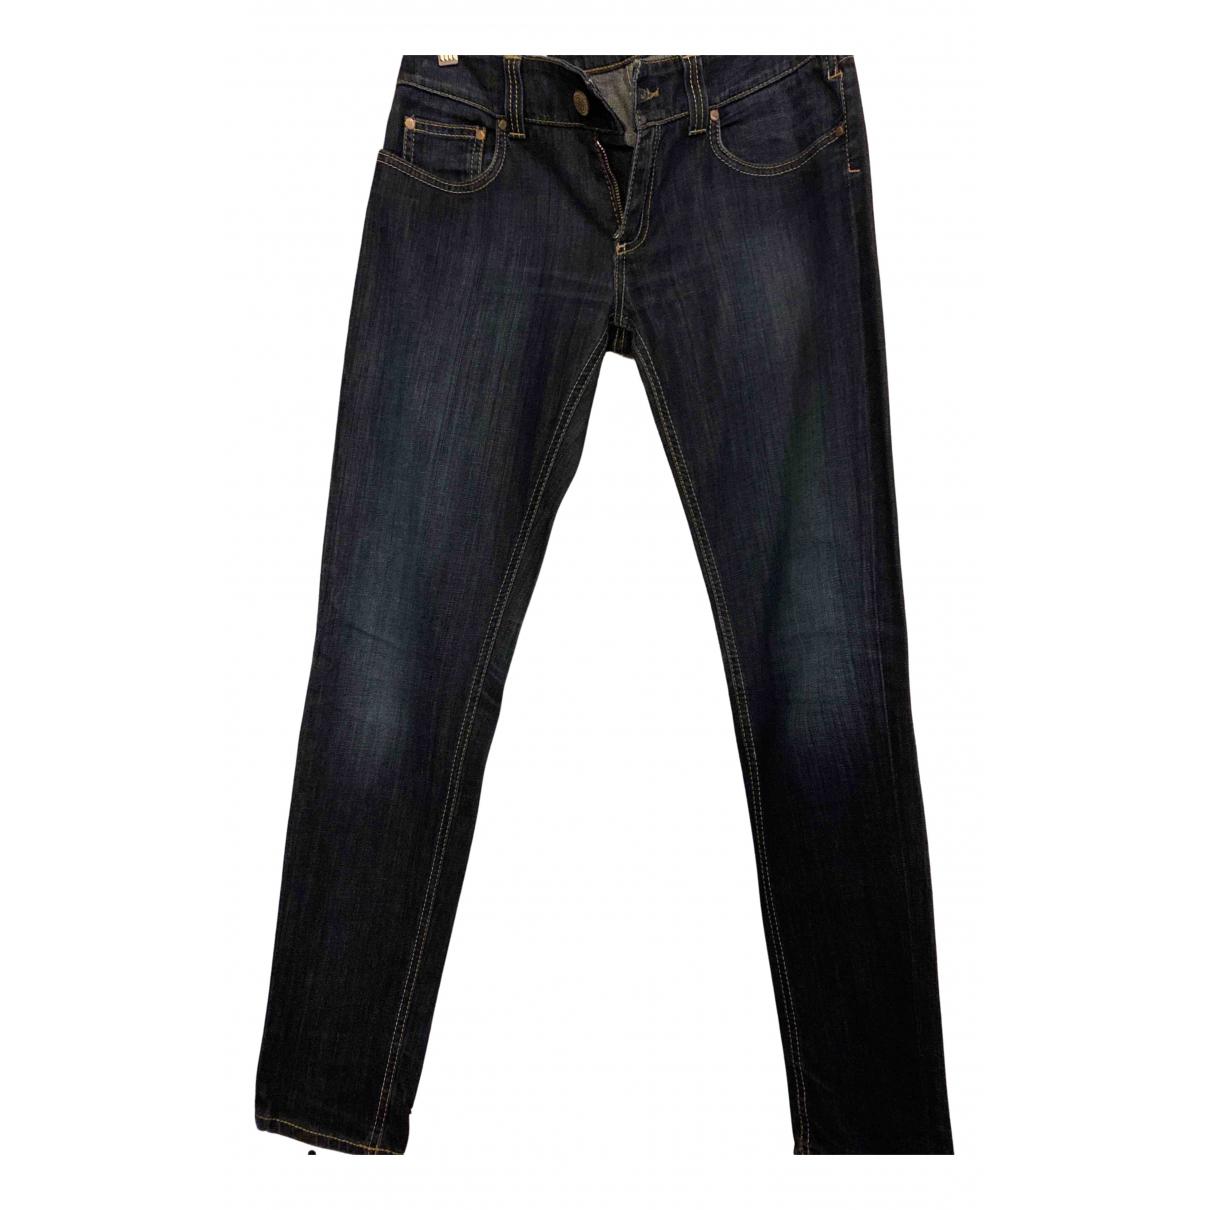 Dondup N Blue Denim - Jeans Jeans for Women 29 US